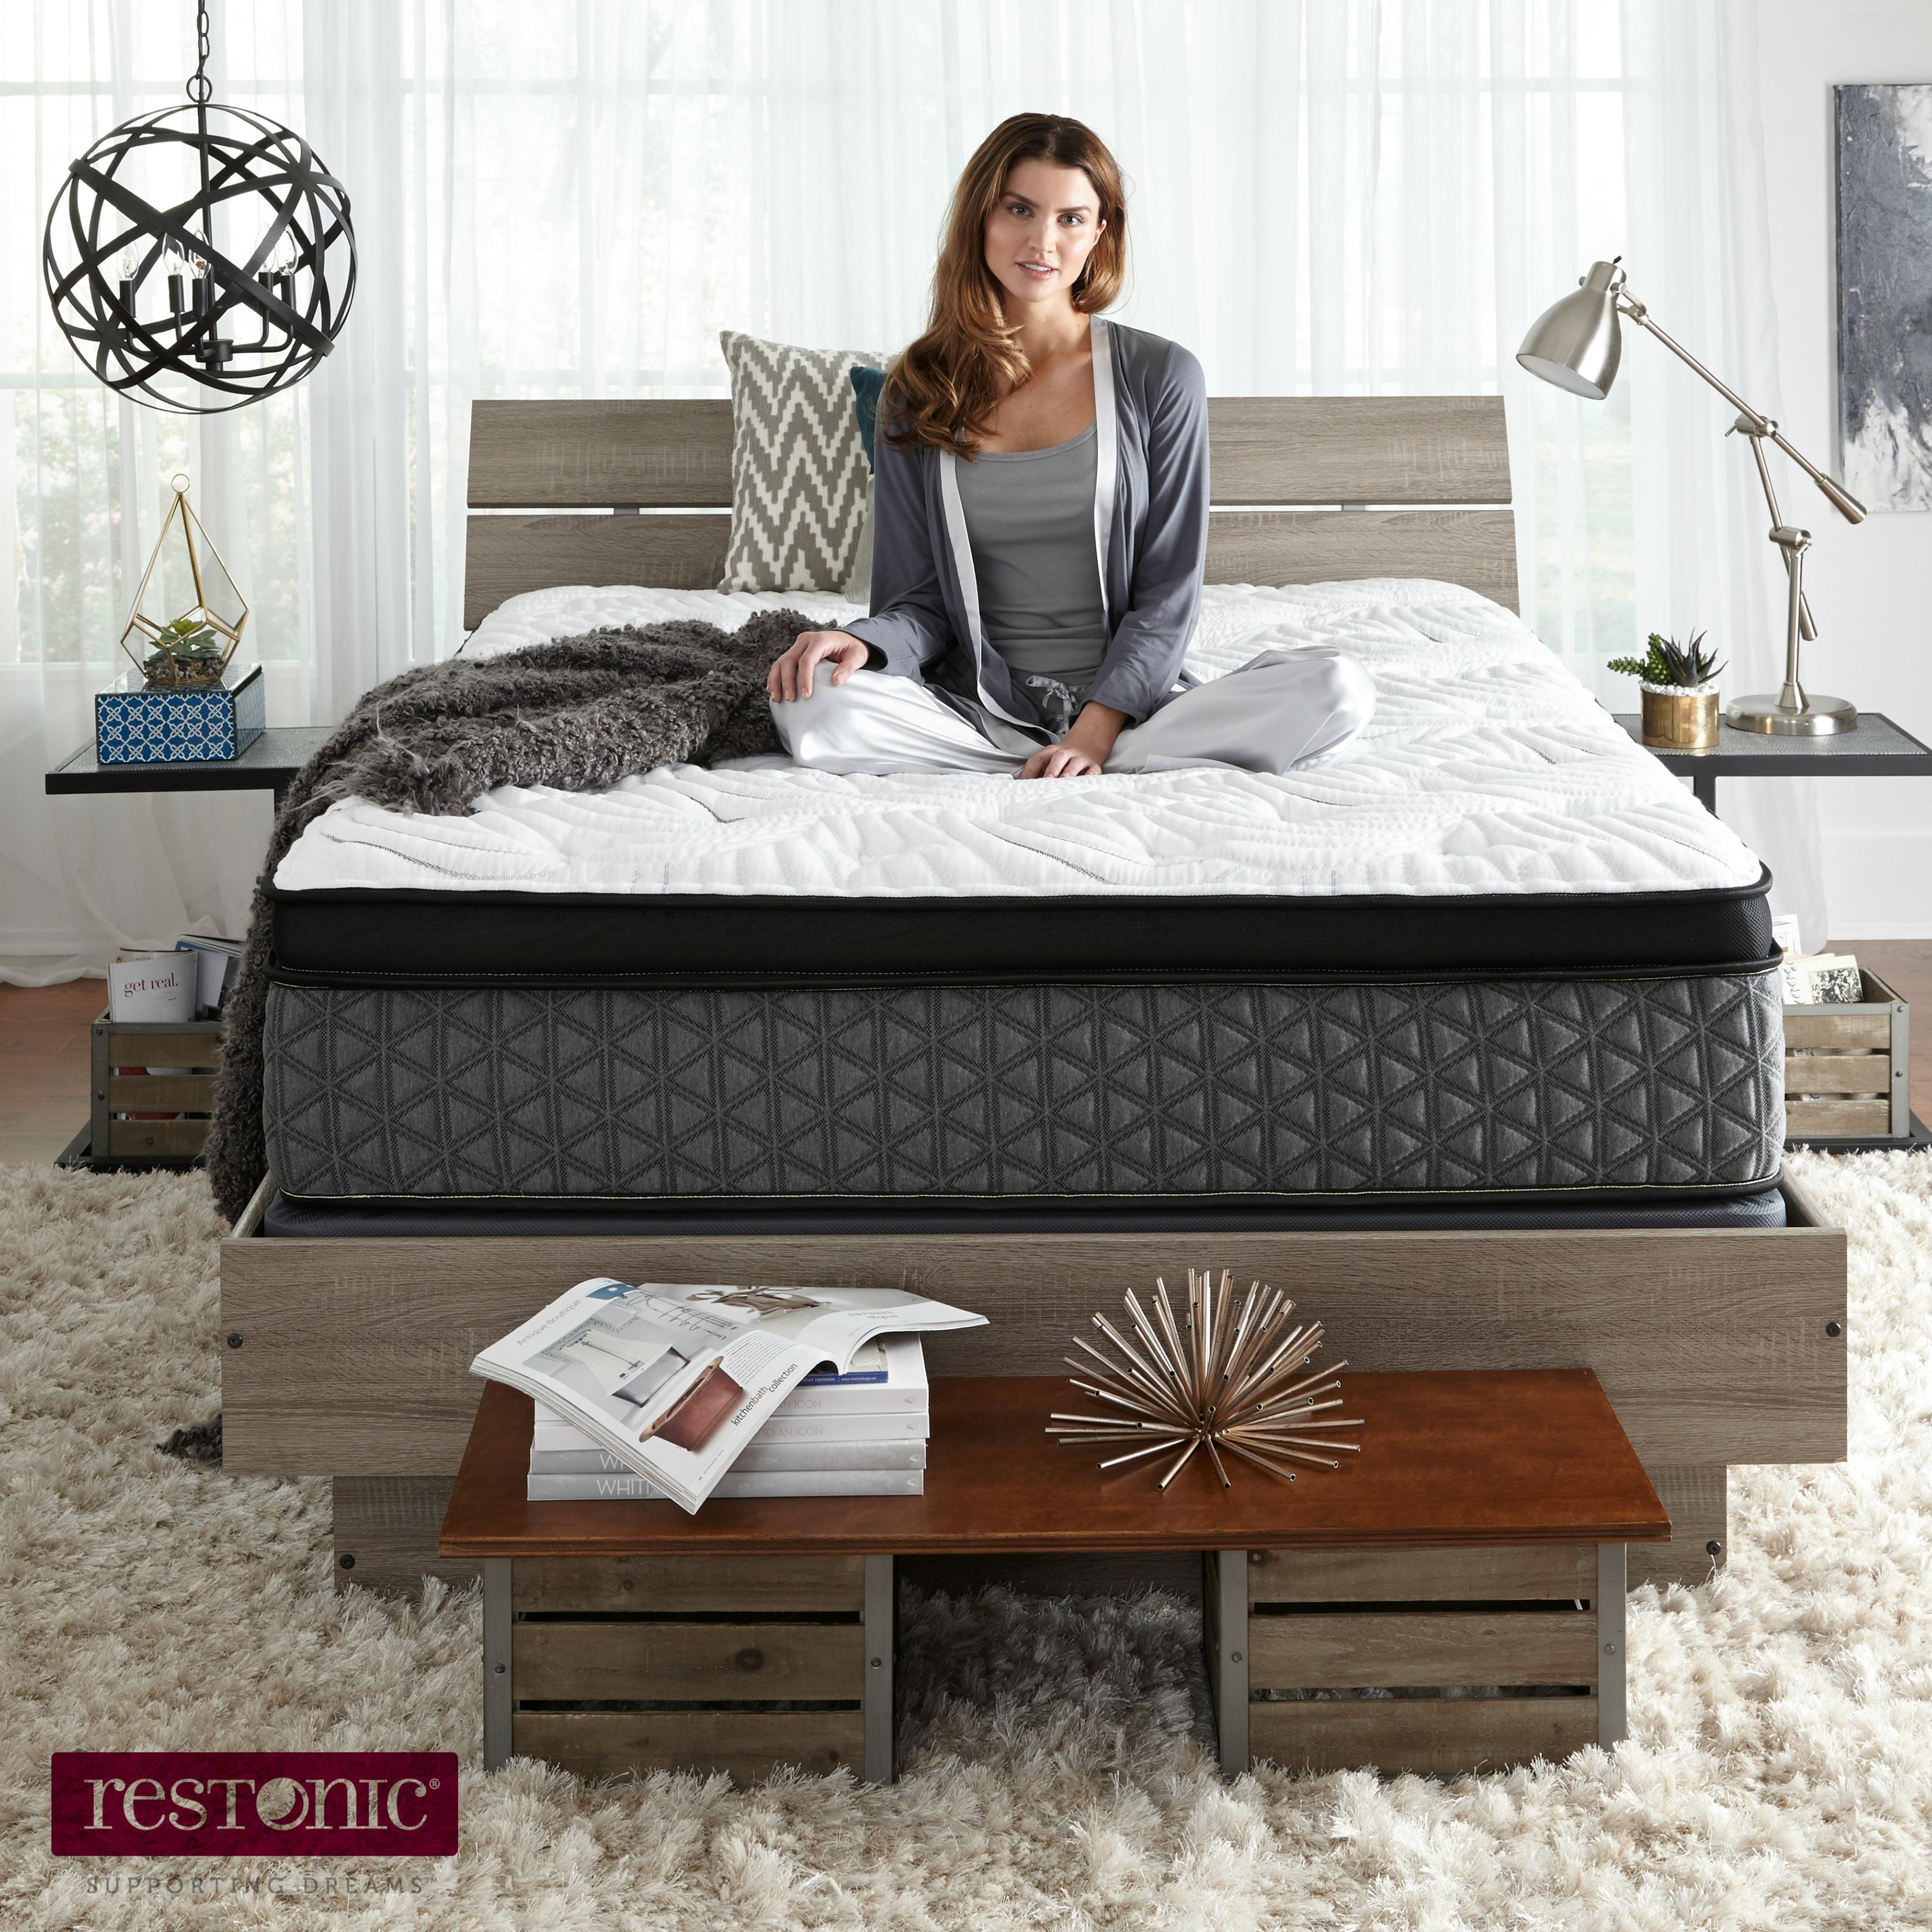 queen canada buy restonic serta tempurpedic reviews mattress set sale online size icomfort prices